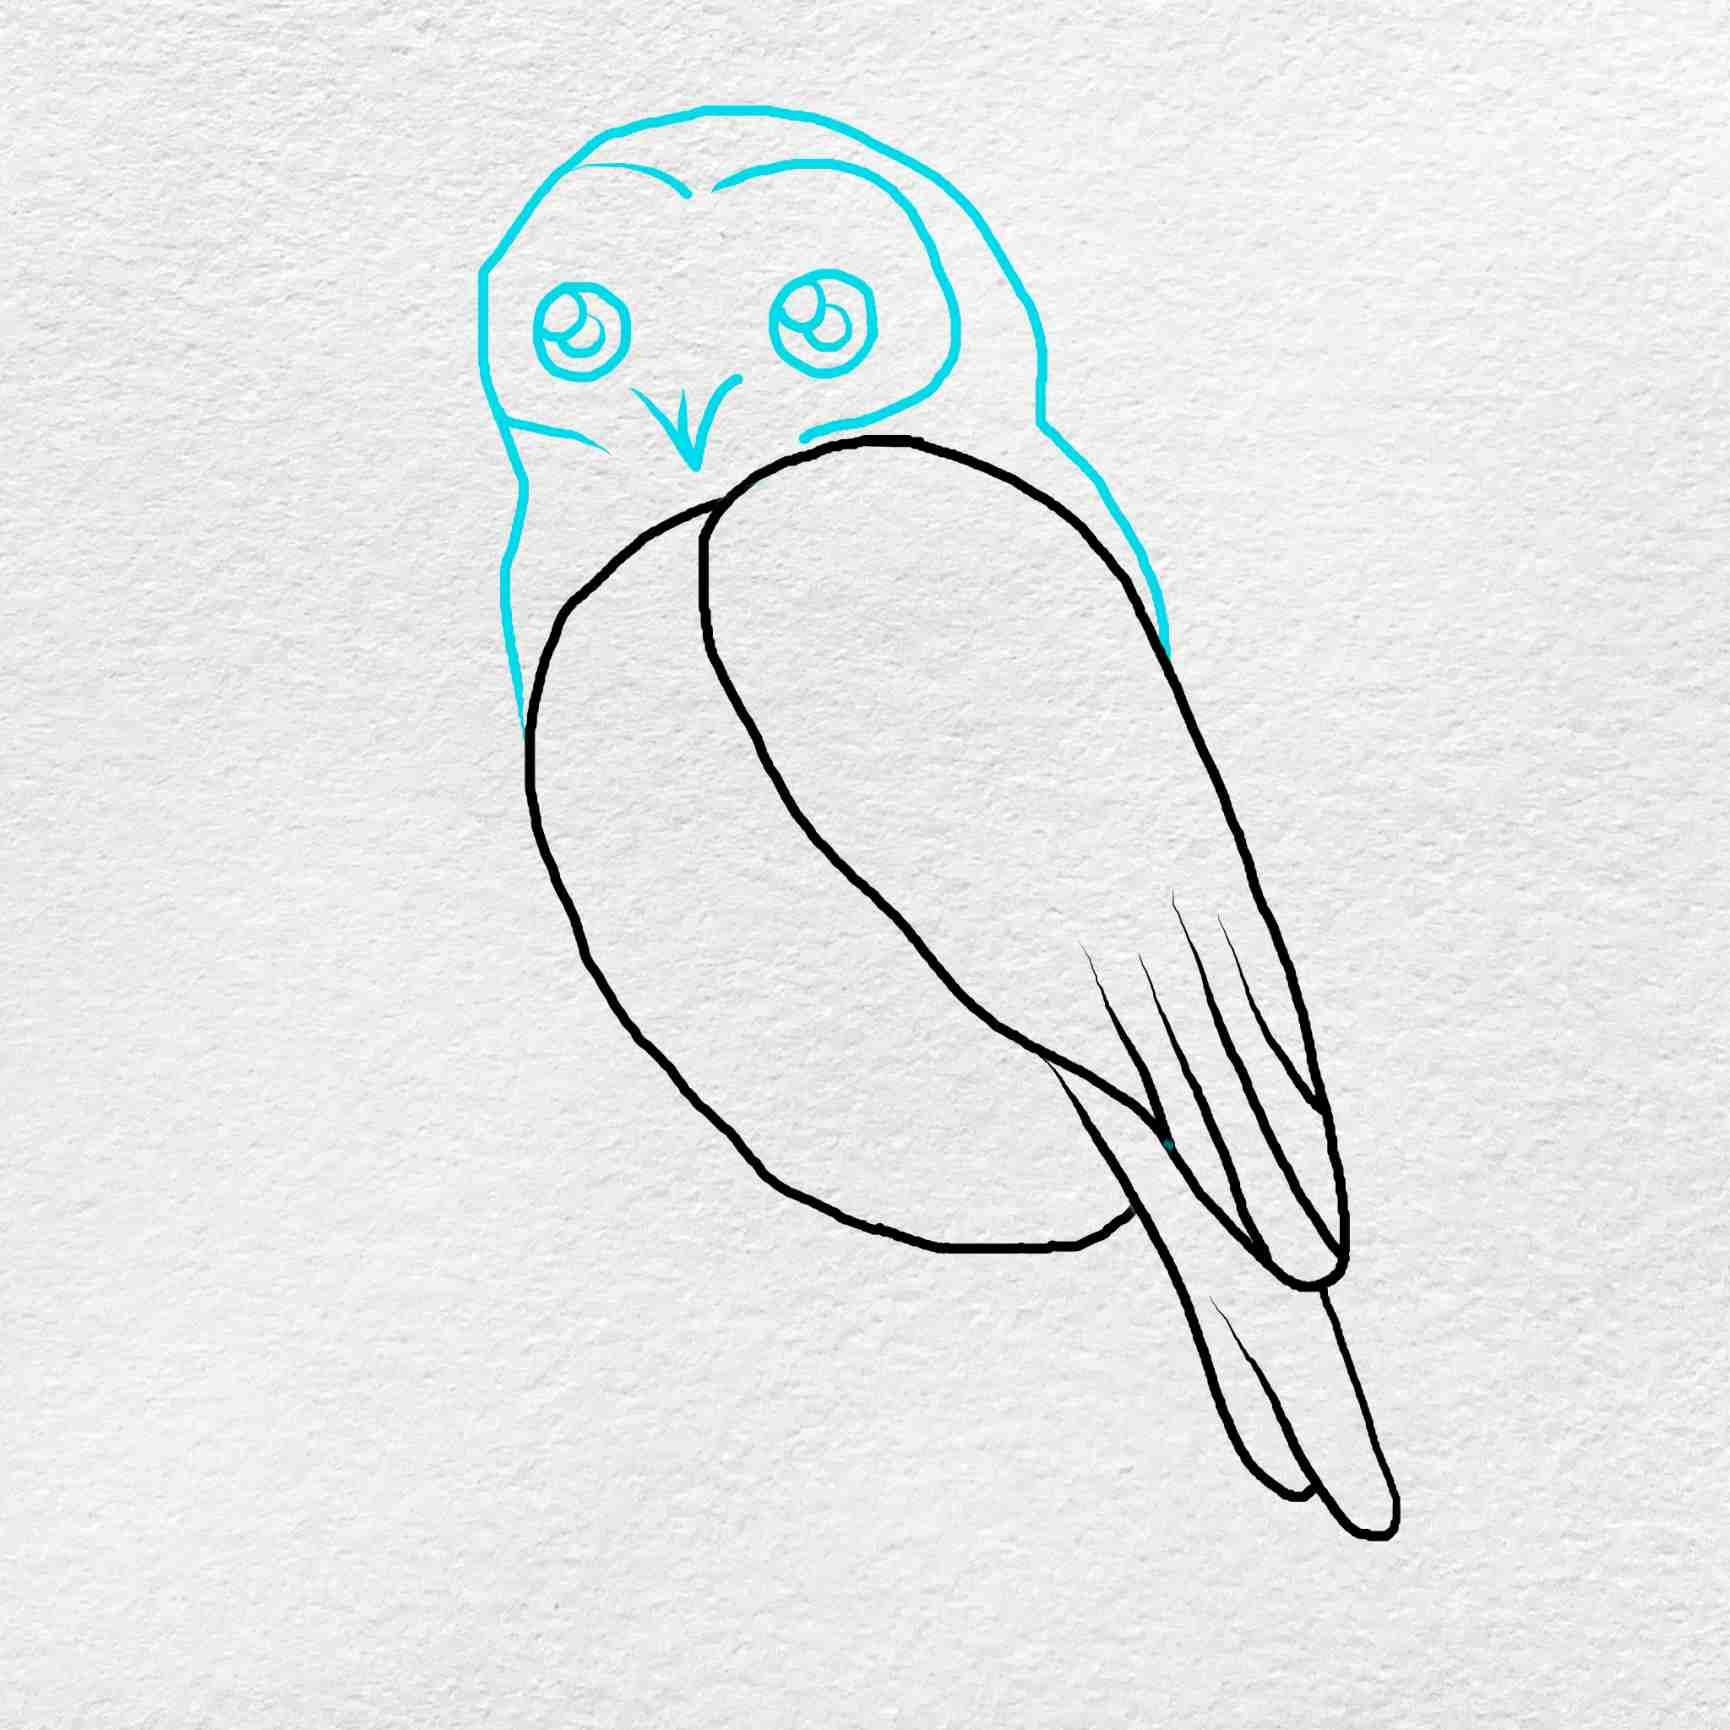 Snowy Owl Drawing: Step 4